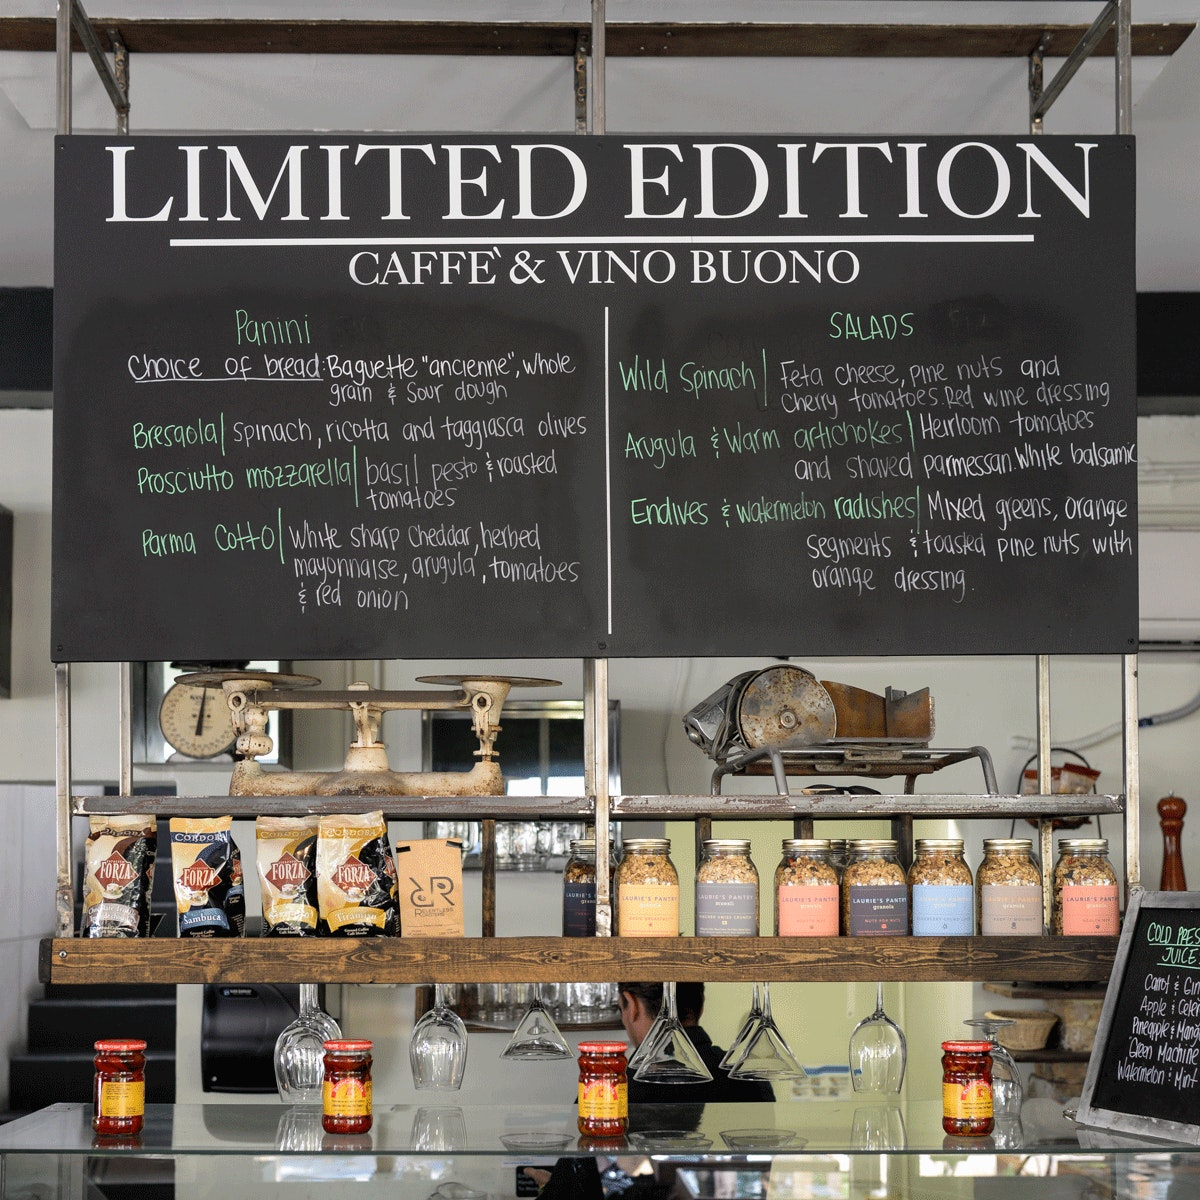 Limited Edition Caffé & Vino Buono